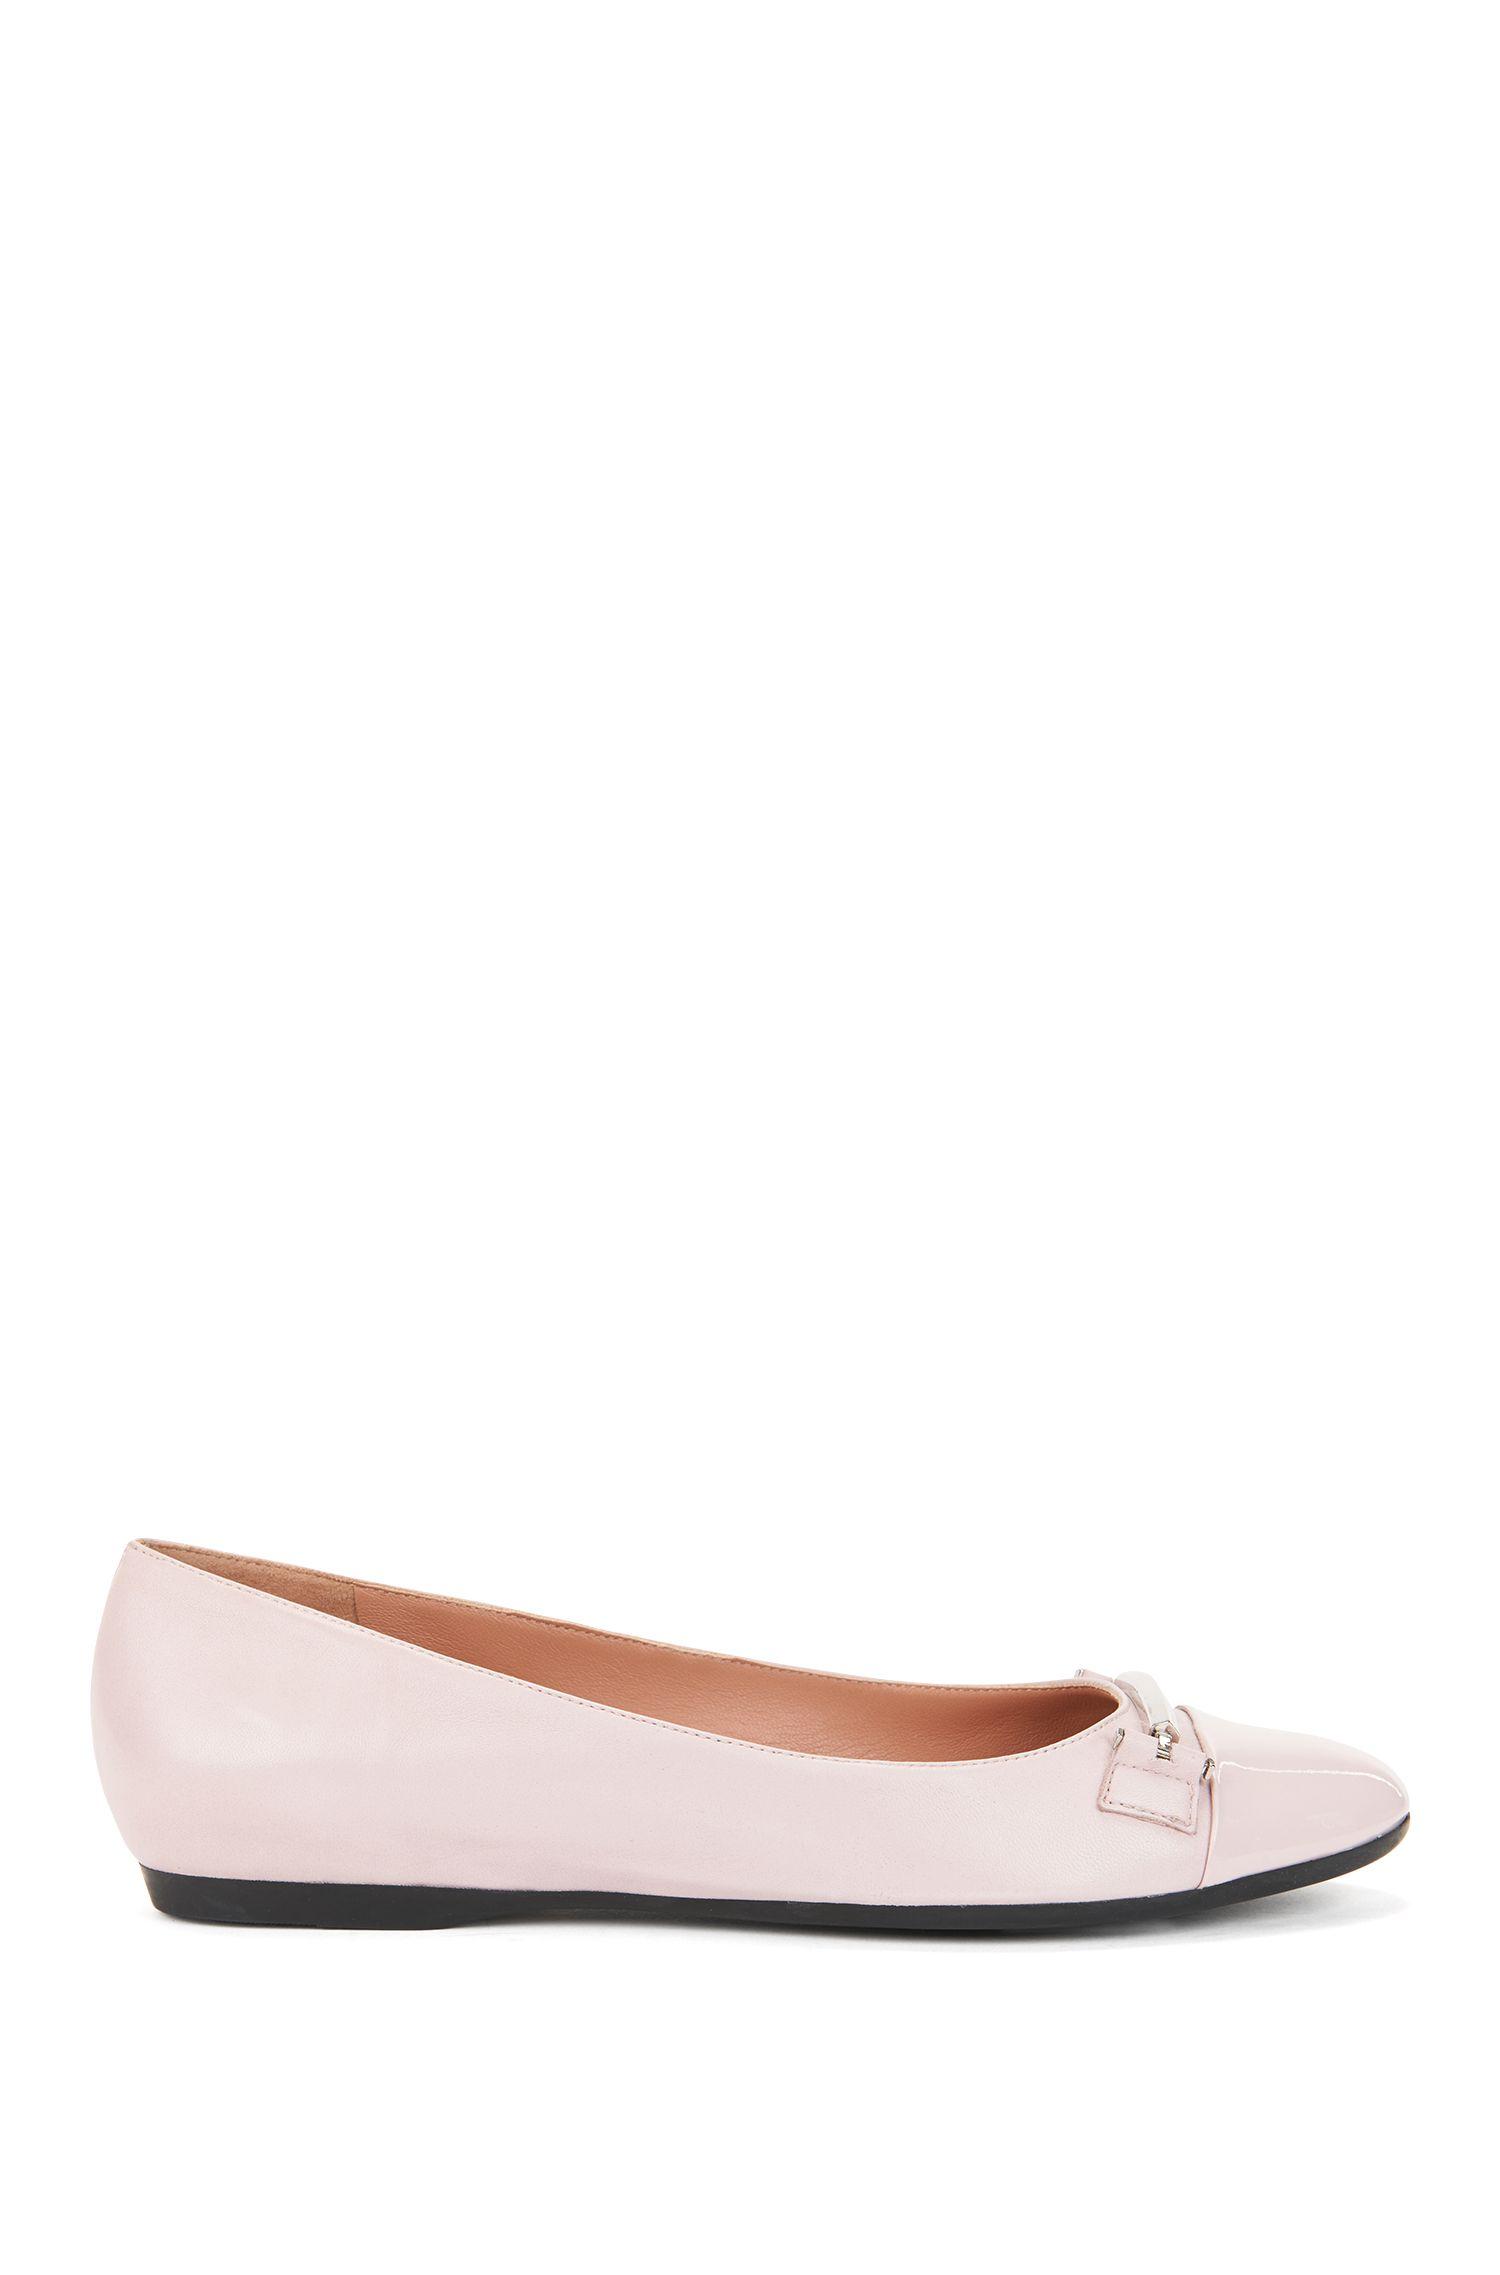 Sheepskin Horsebit Flat | Lara Ballerina, light pink